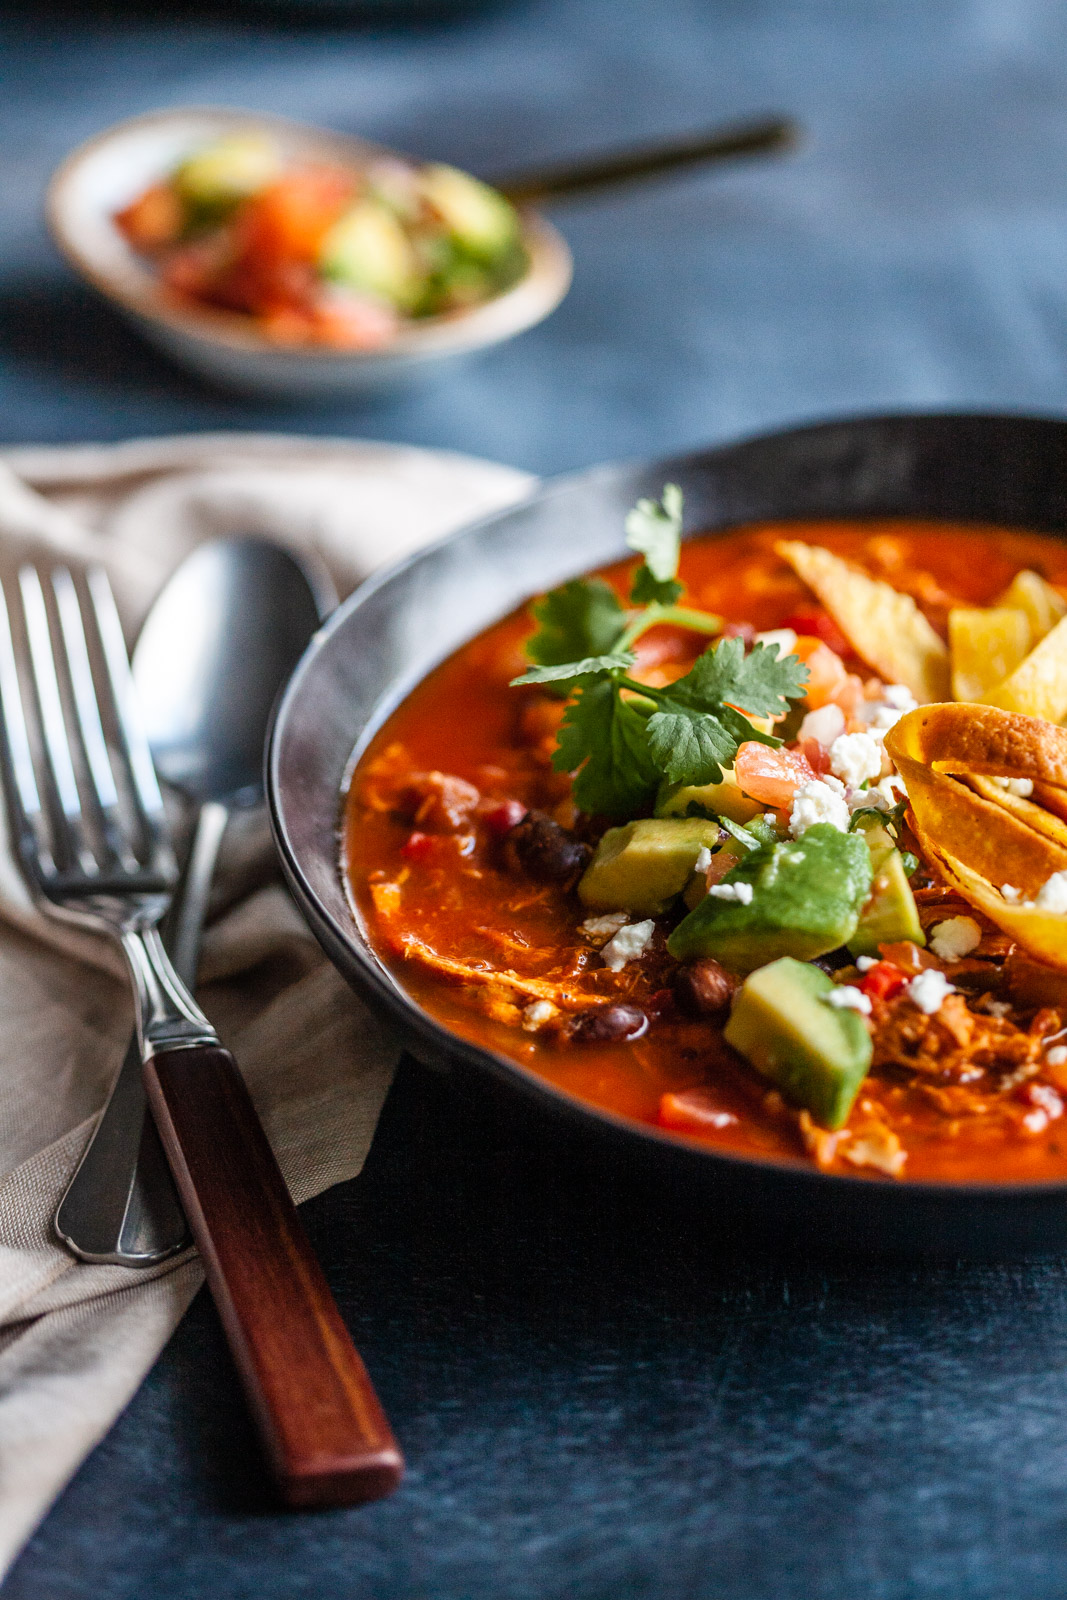 Chicken Tortilla Soup With Salsa And Homemade Tortillas